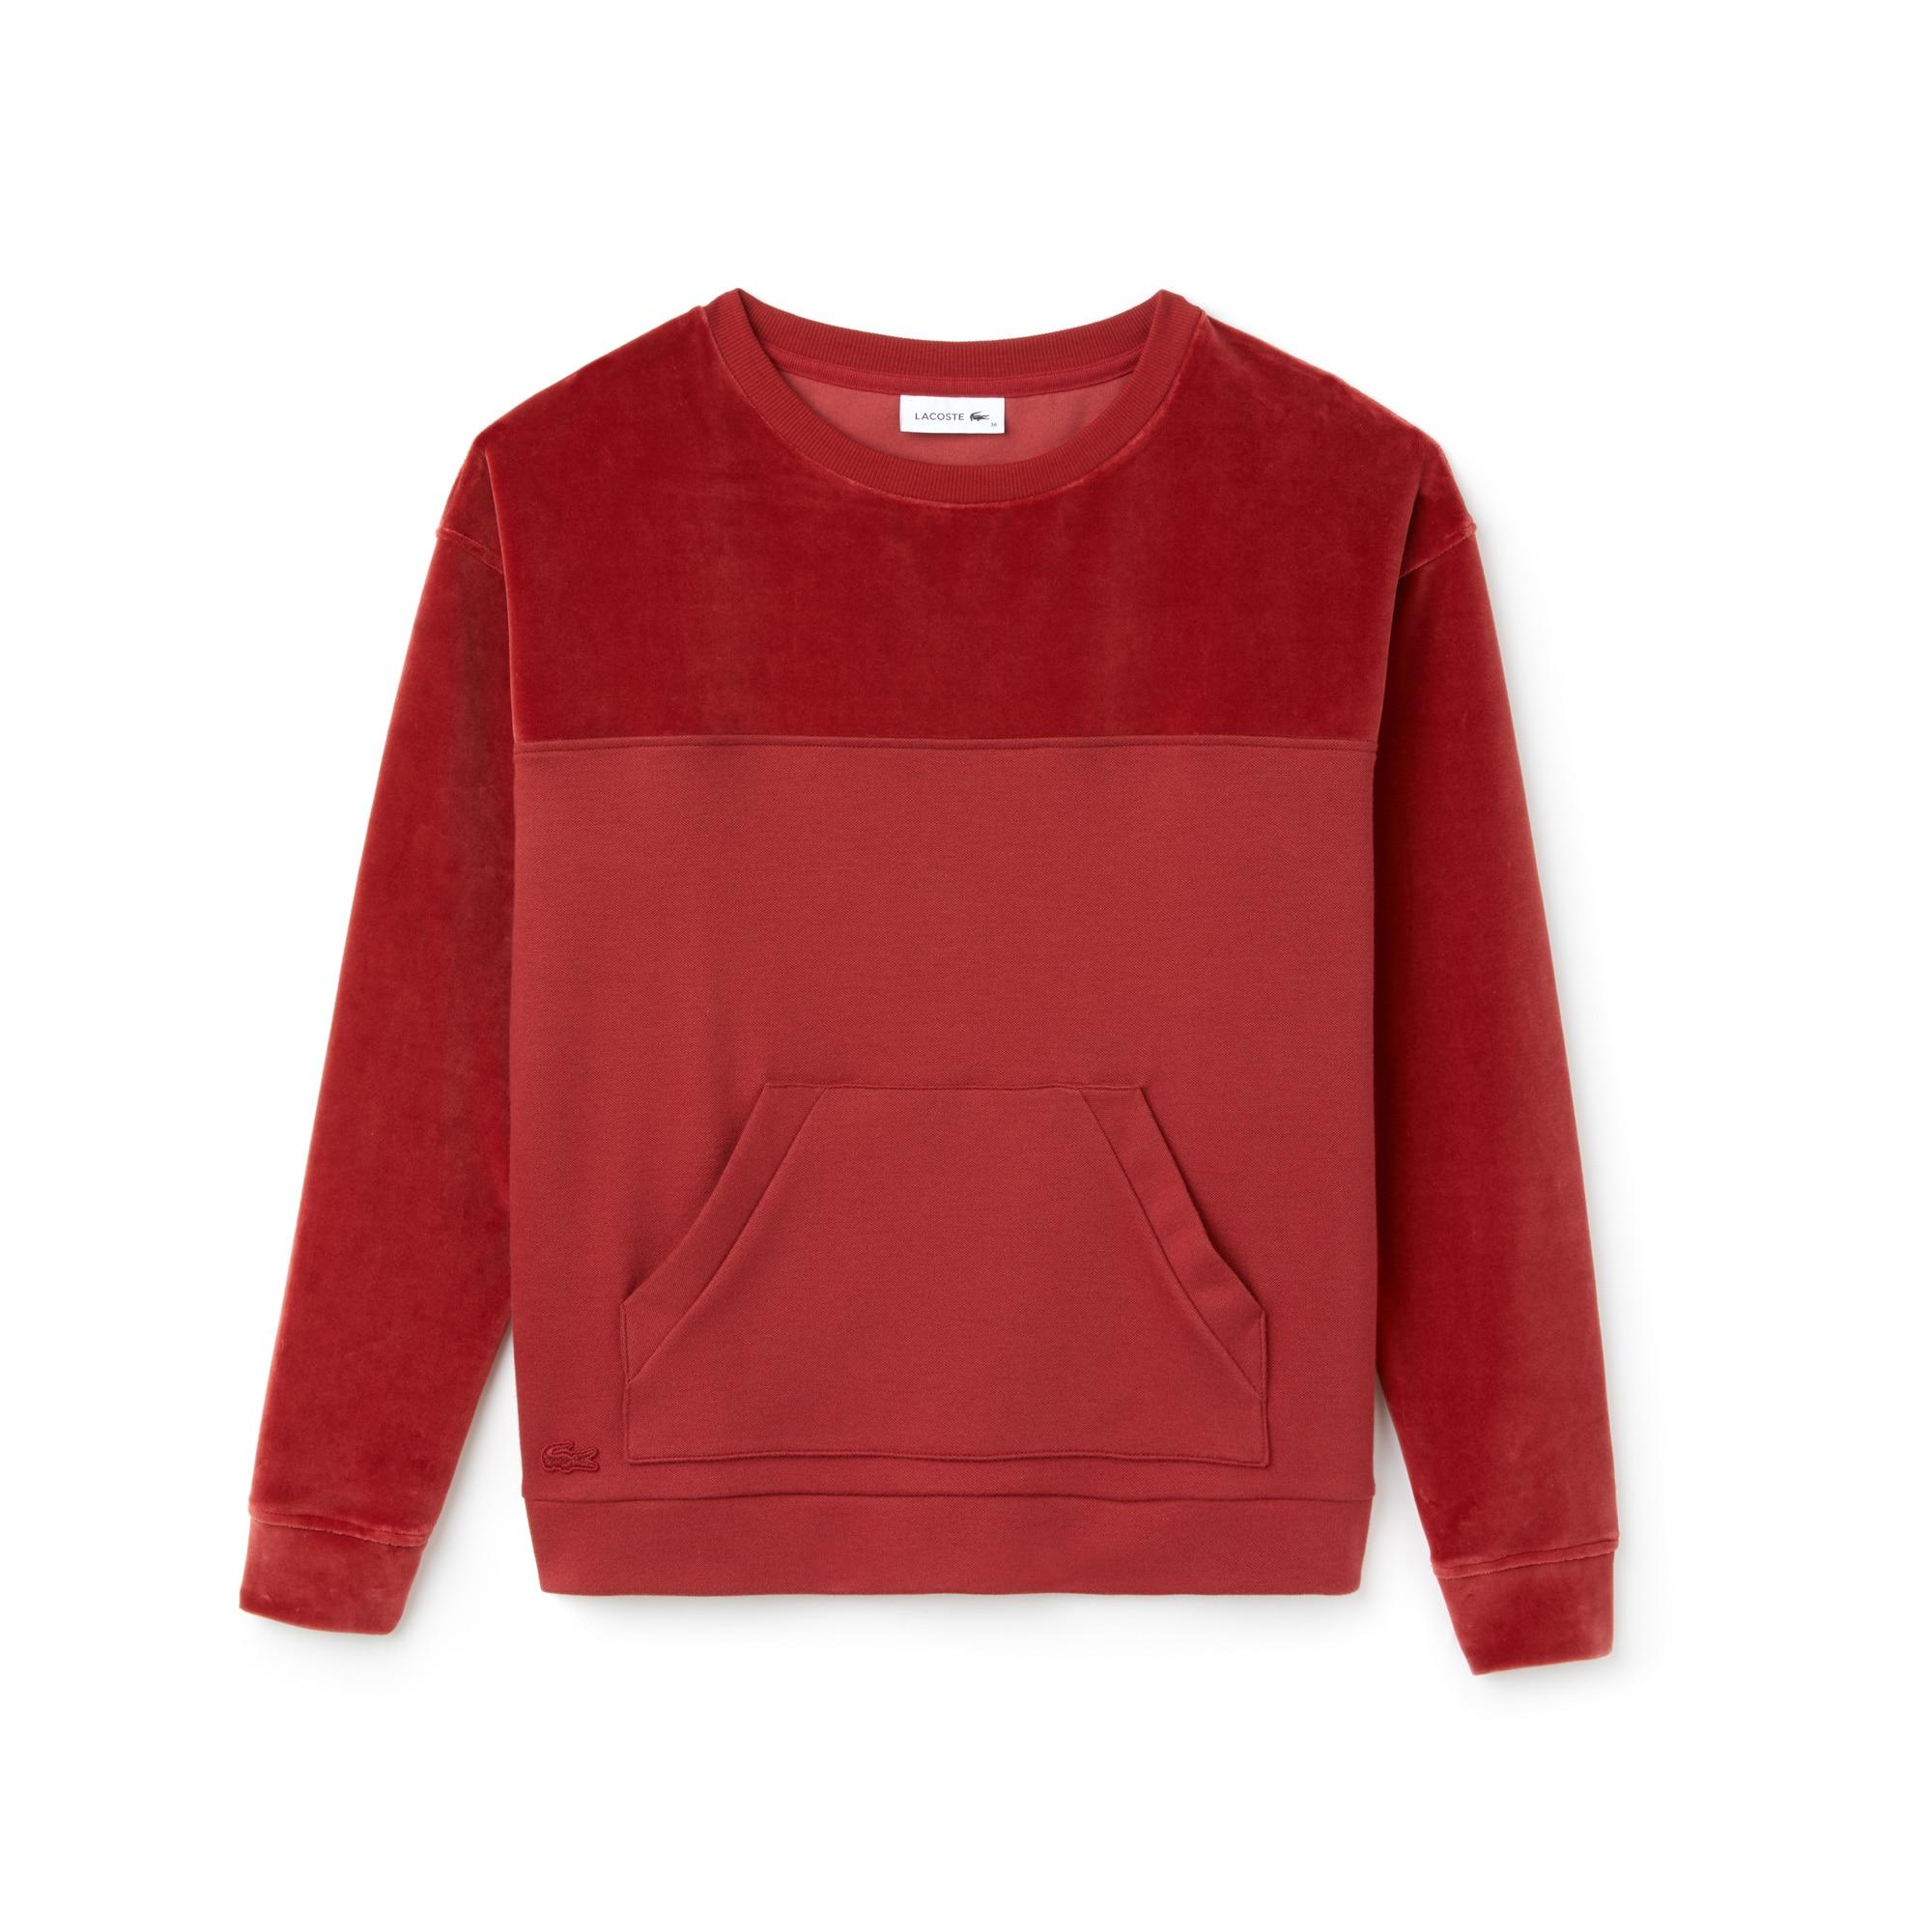 Sweatshirt decote redondo em jersey e veludo unicolor